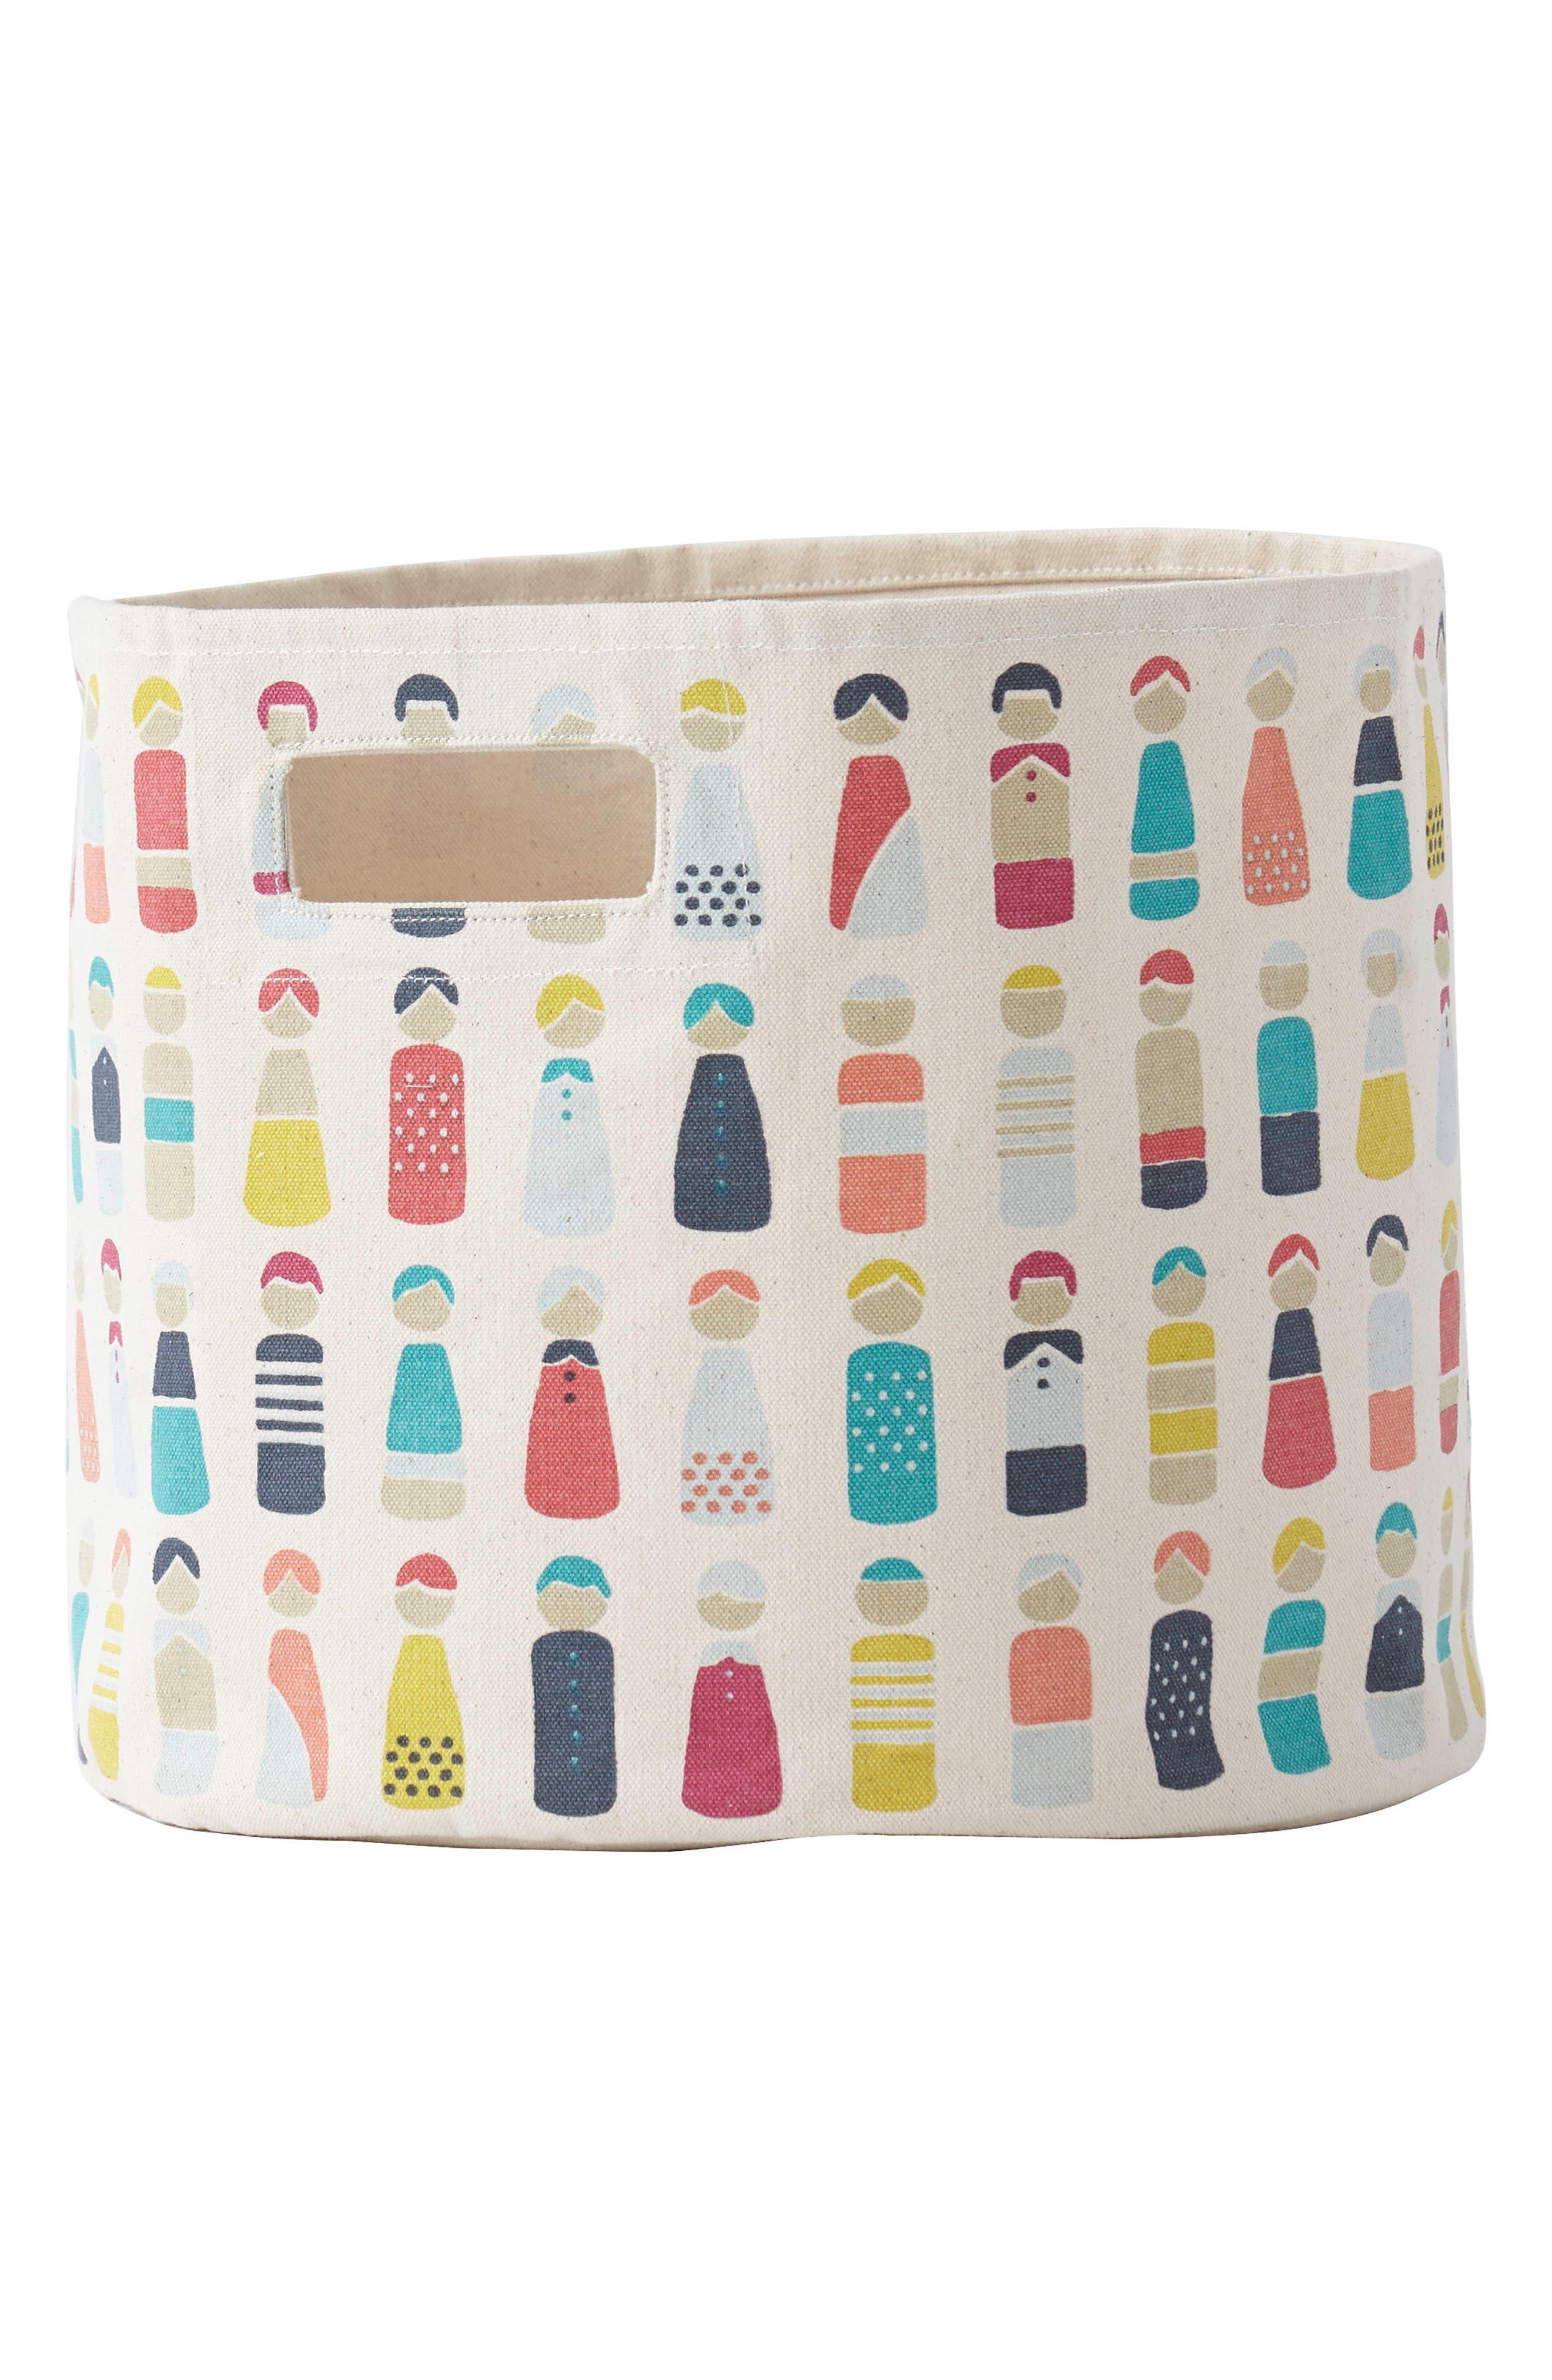 Little Peeps Mini Canvas Bin,                             Main thumbnail 1, color,                             Multi